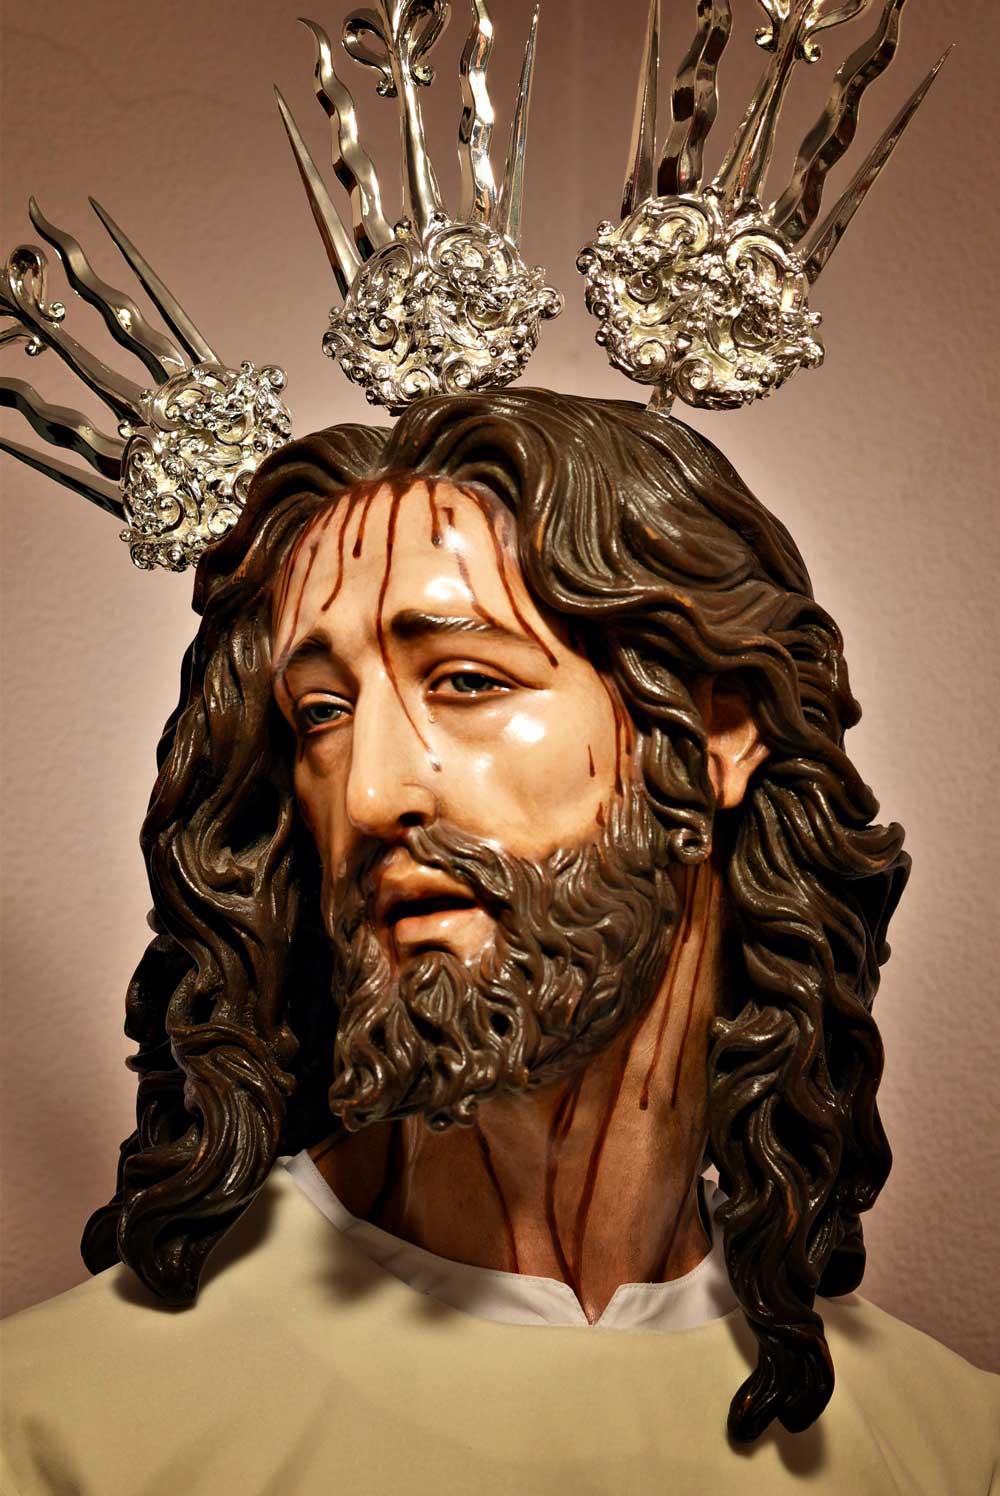 ntro-padre-jesus-cautivo-de-la-misericordia-valencia-devocion-particular-8